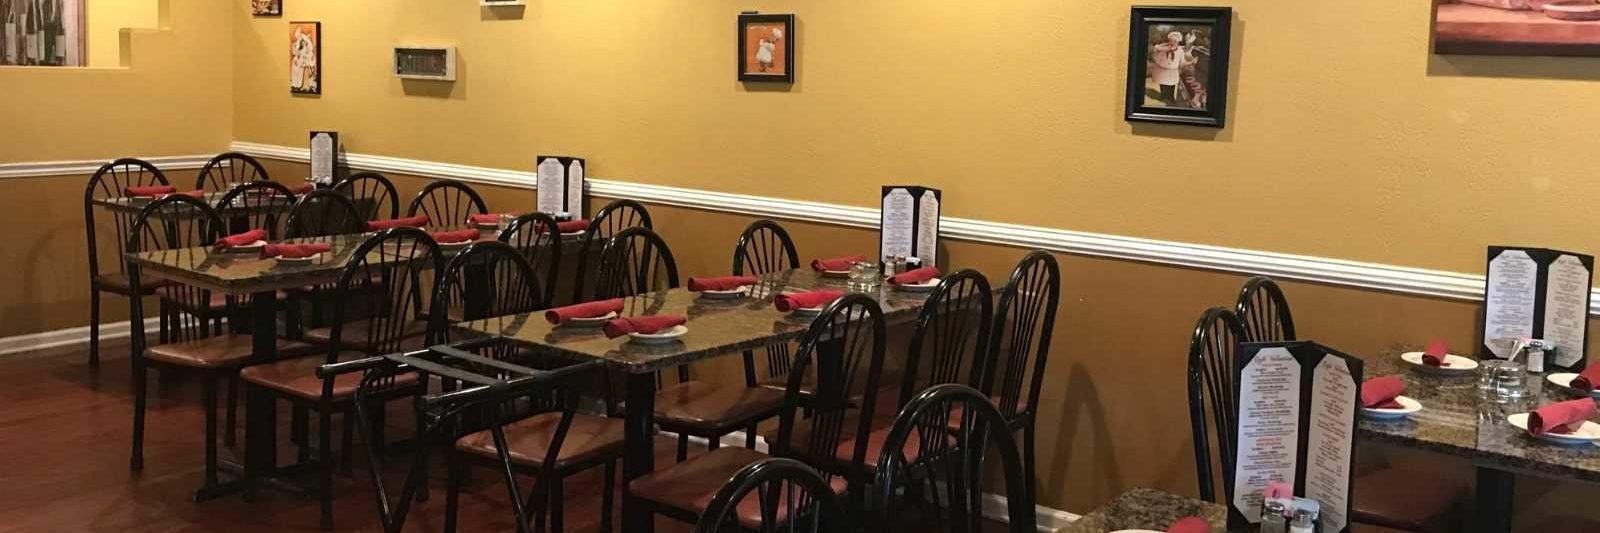 Cafe Valentina Italian Restaurant